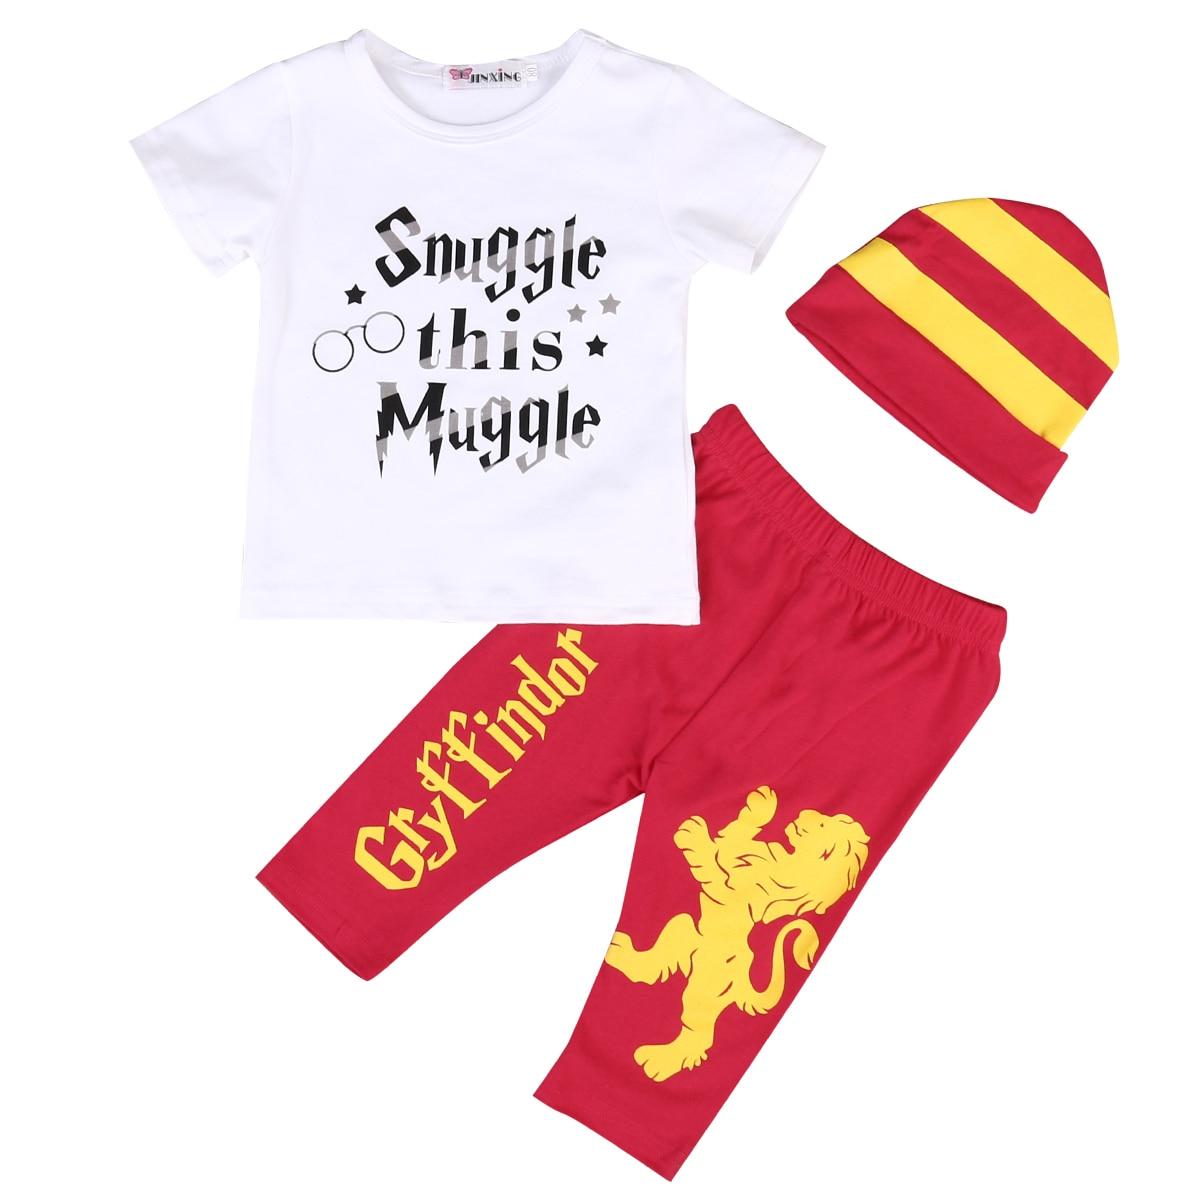 Snuggle this Muggle Newborn Infant Baby Boy Gilr Outfits Clothes Short Sleeve T-shirt Tops Pant Hat 3PCS Outfit Bebek Giyim вибромассажер мини snuggle bug фиолетовый